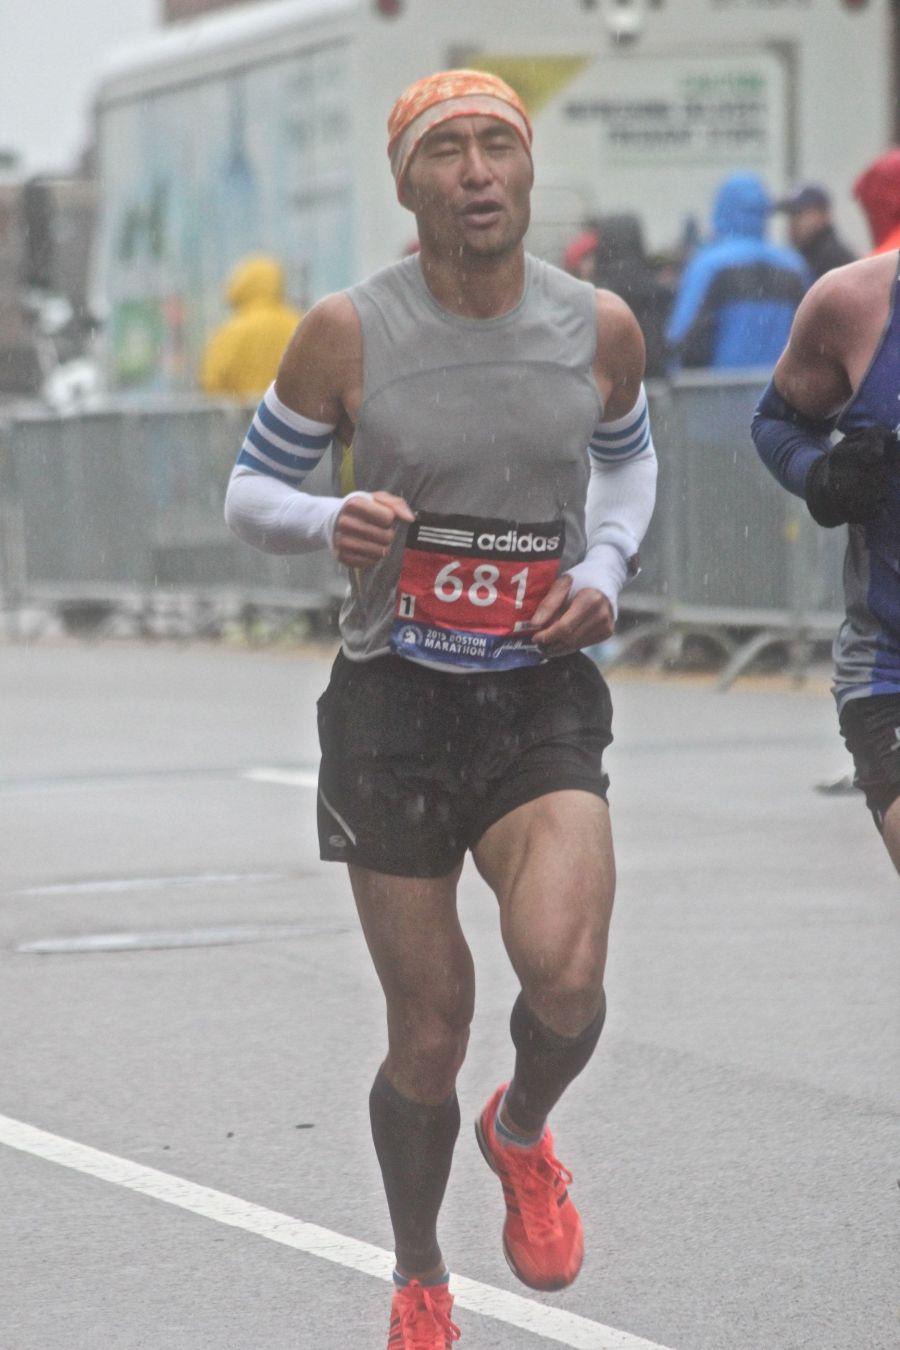 boston marathon april 20 2015 racer number 681